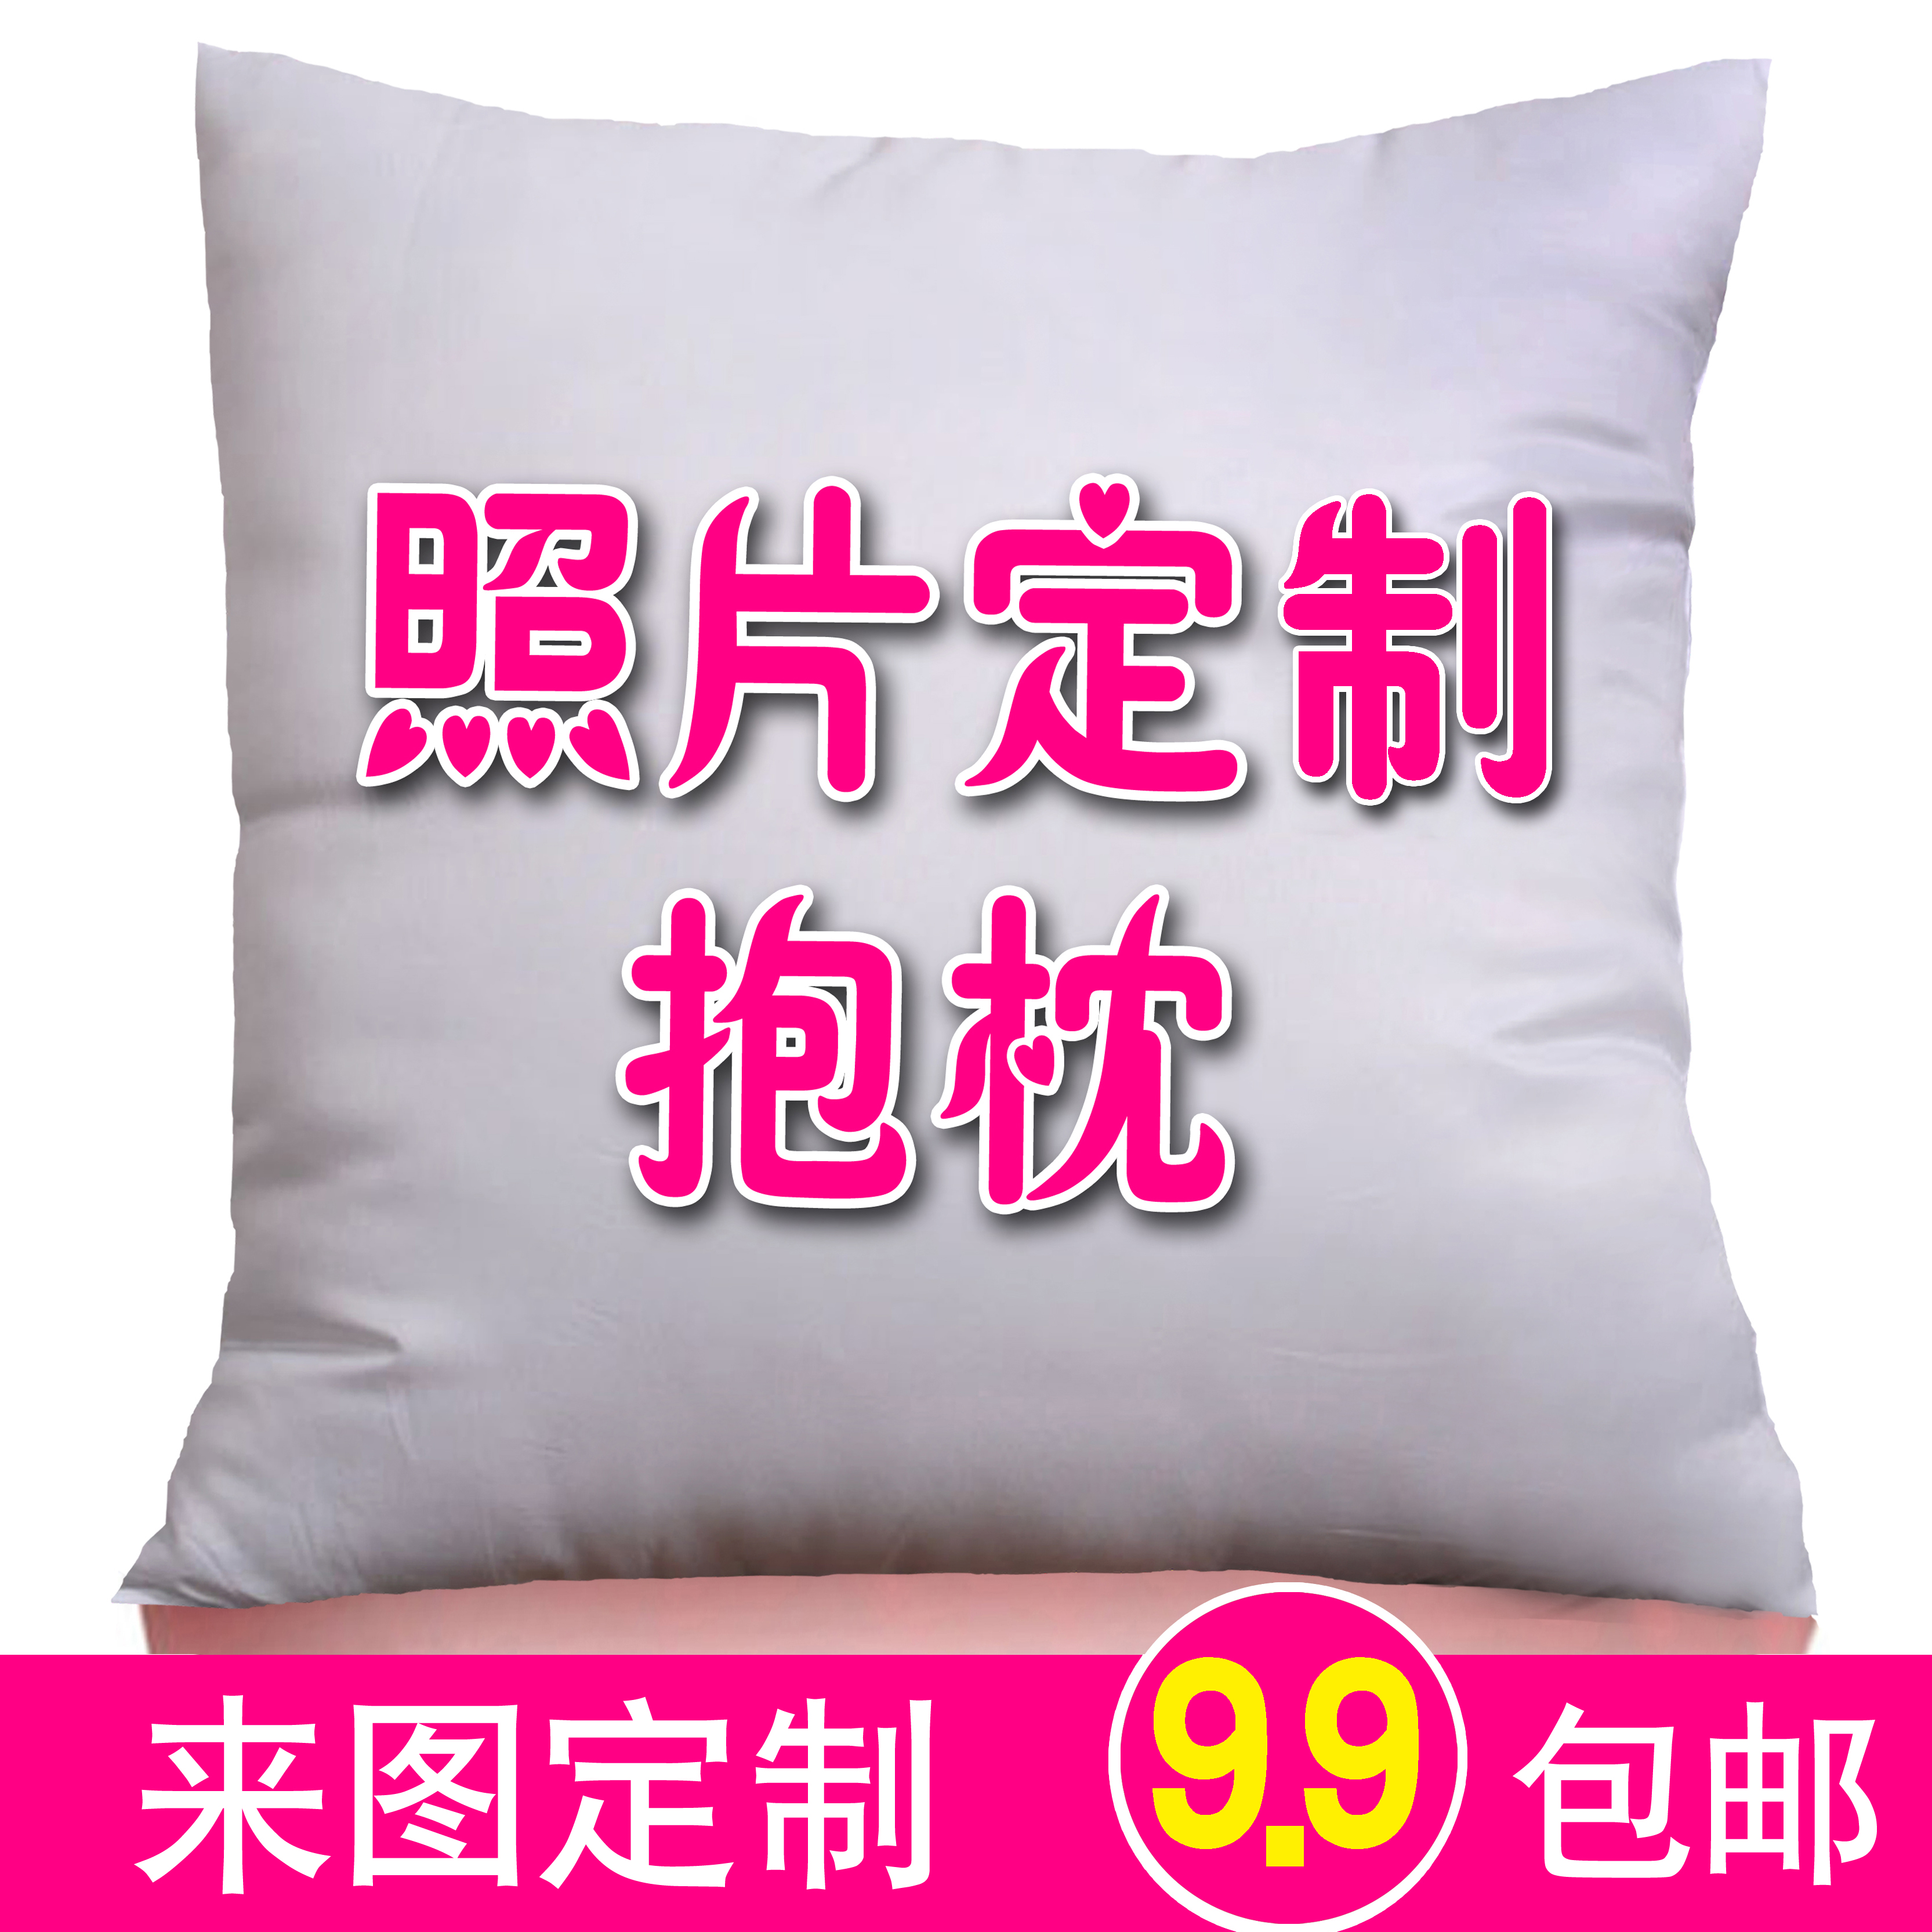 DIY来图定制订做照片抱枕创意明星枕头被子肖战 王一博学生靠枕